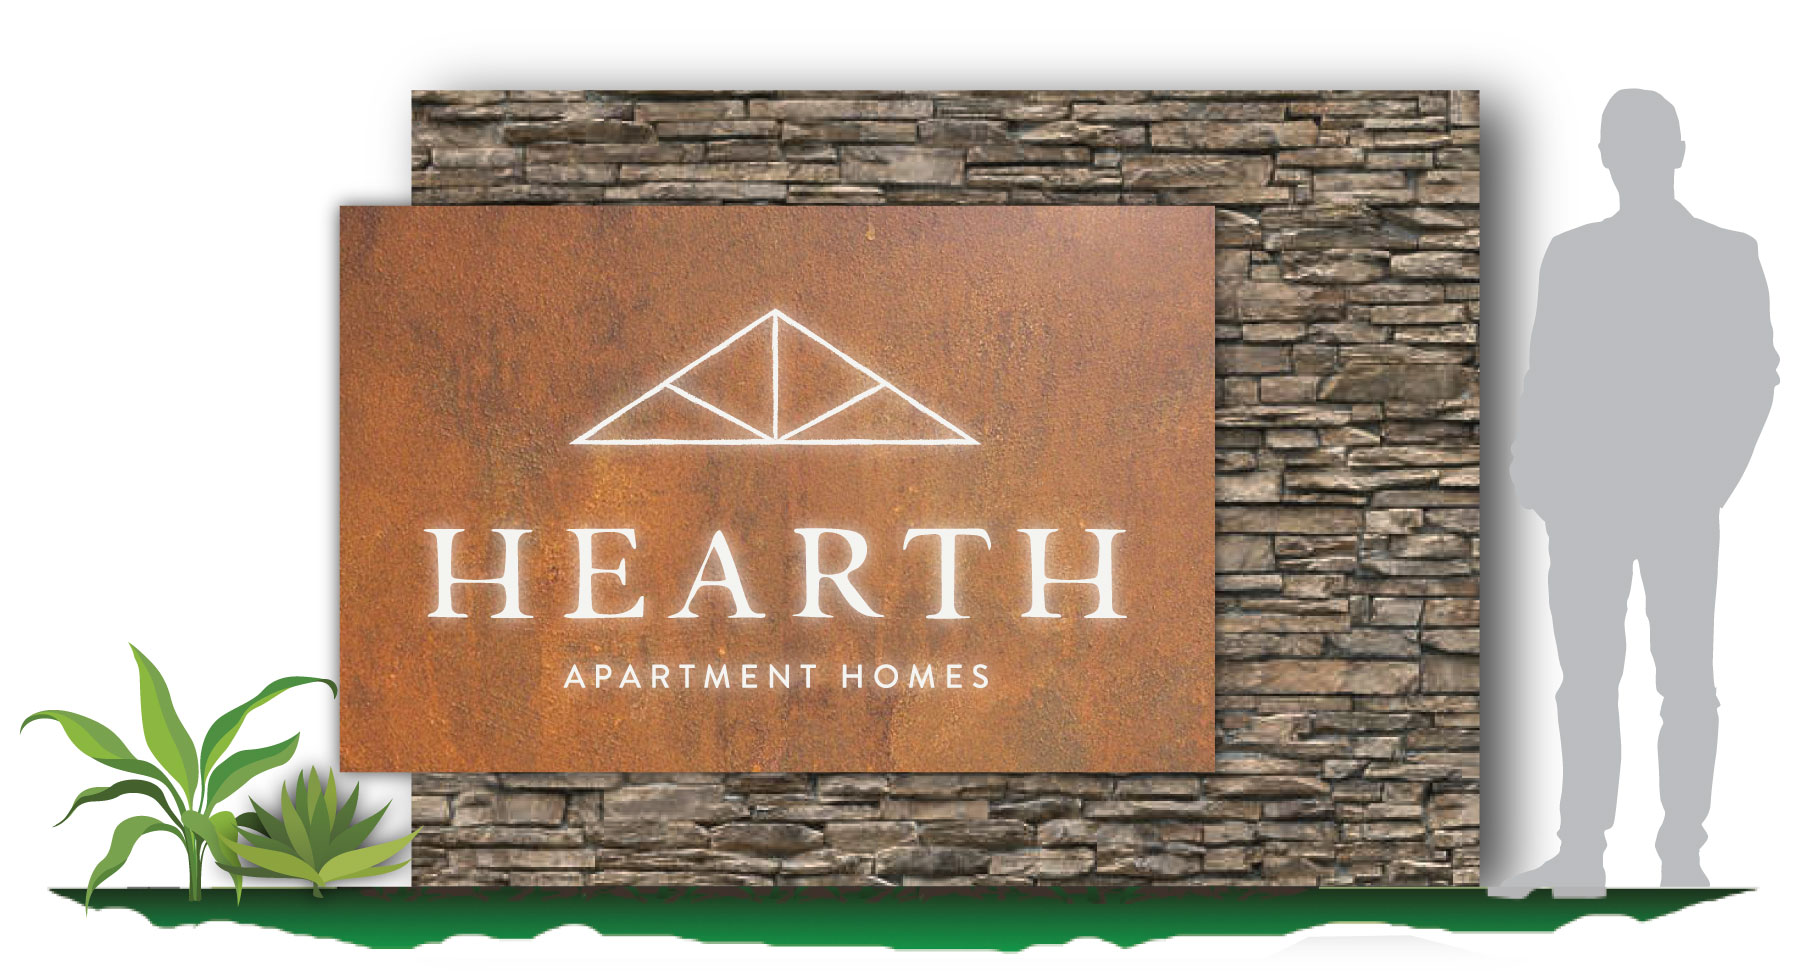 Hearth-Monument-Sign.jpg